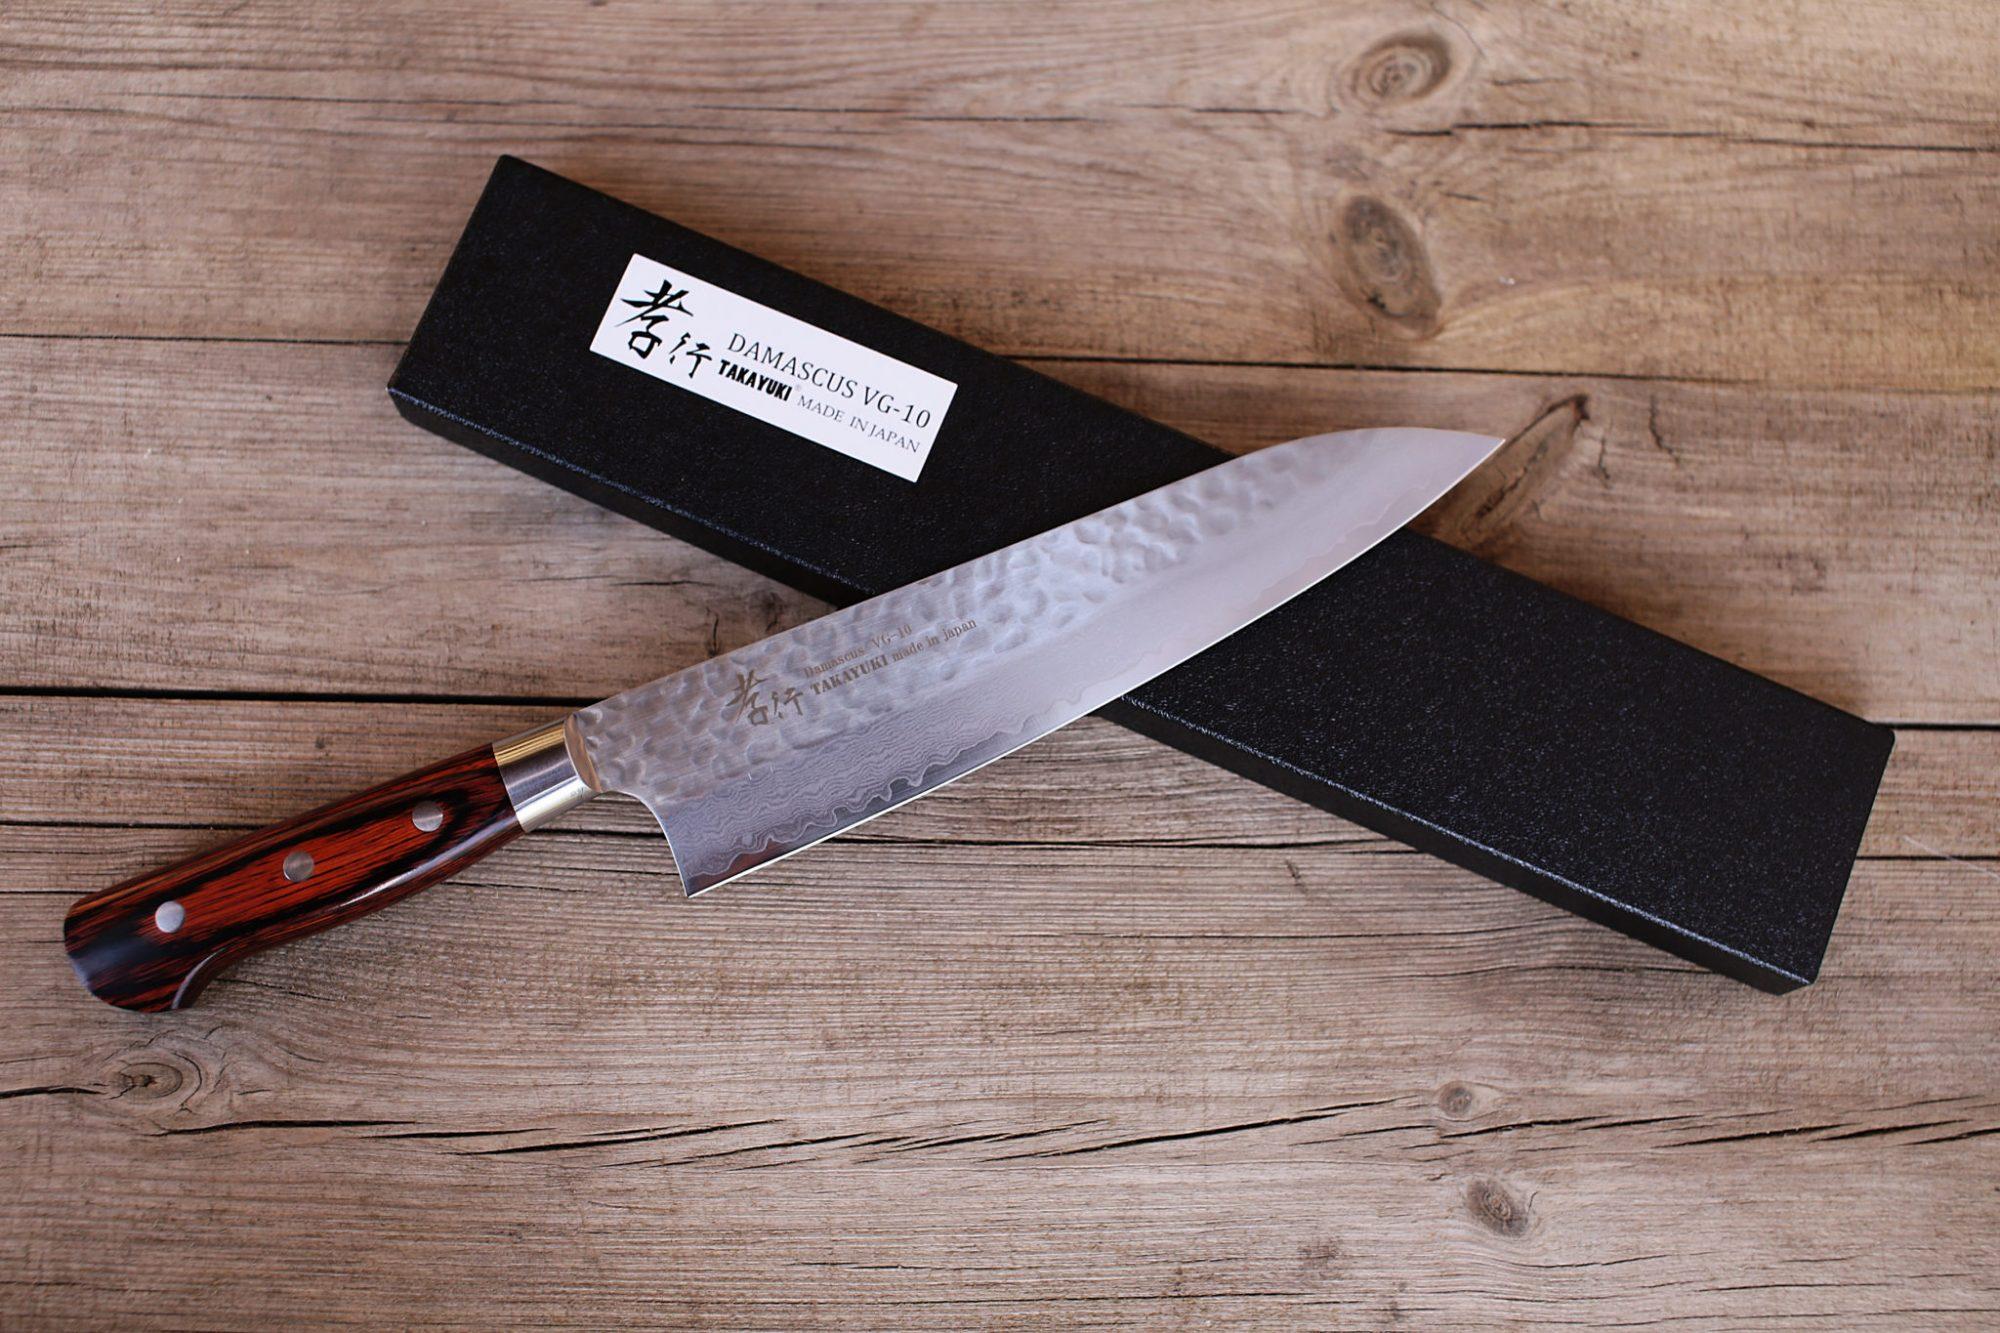 sakai takayuki 33 layer damascus gyuto 210mm vg 10 japanese sakai takayuki 33 layer damascus gyuto 240mm